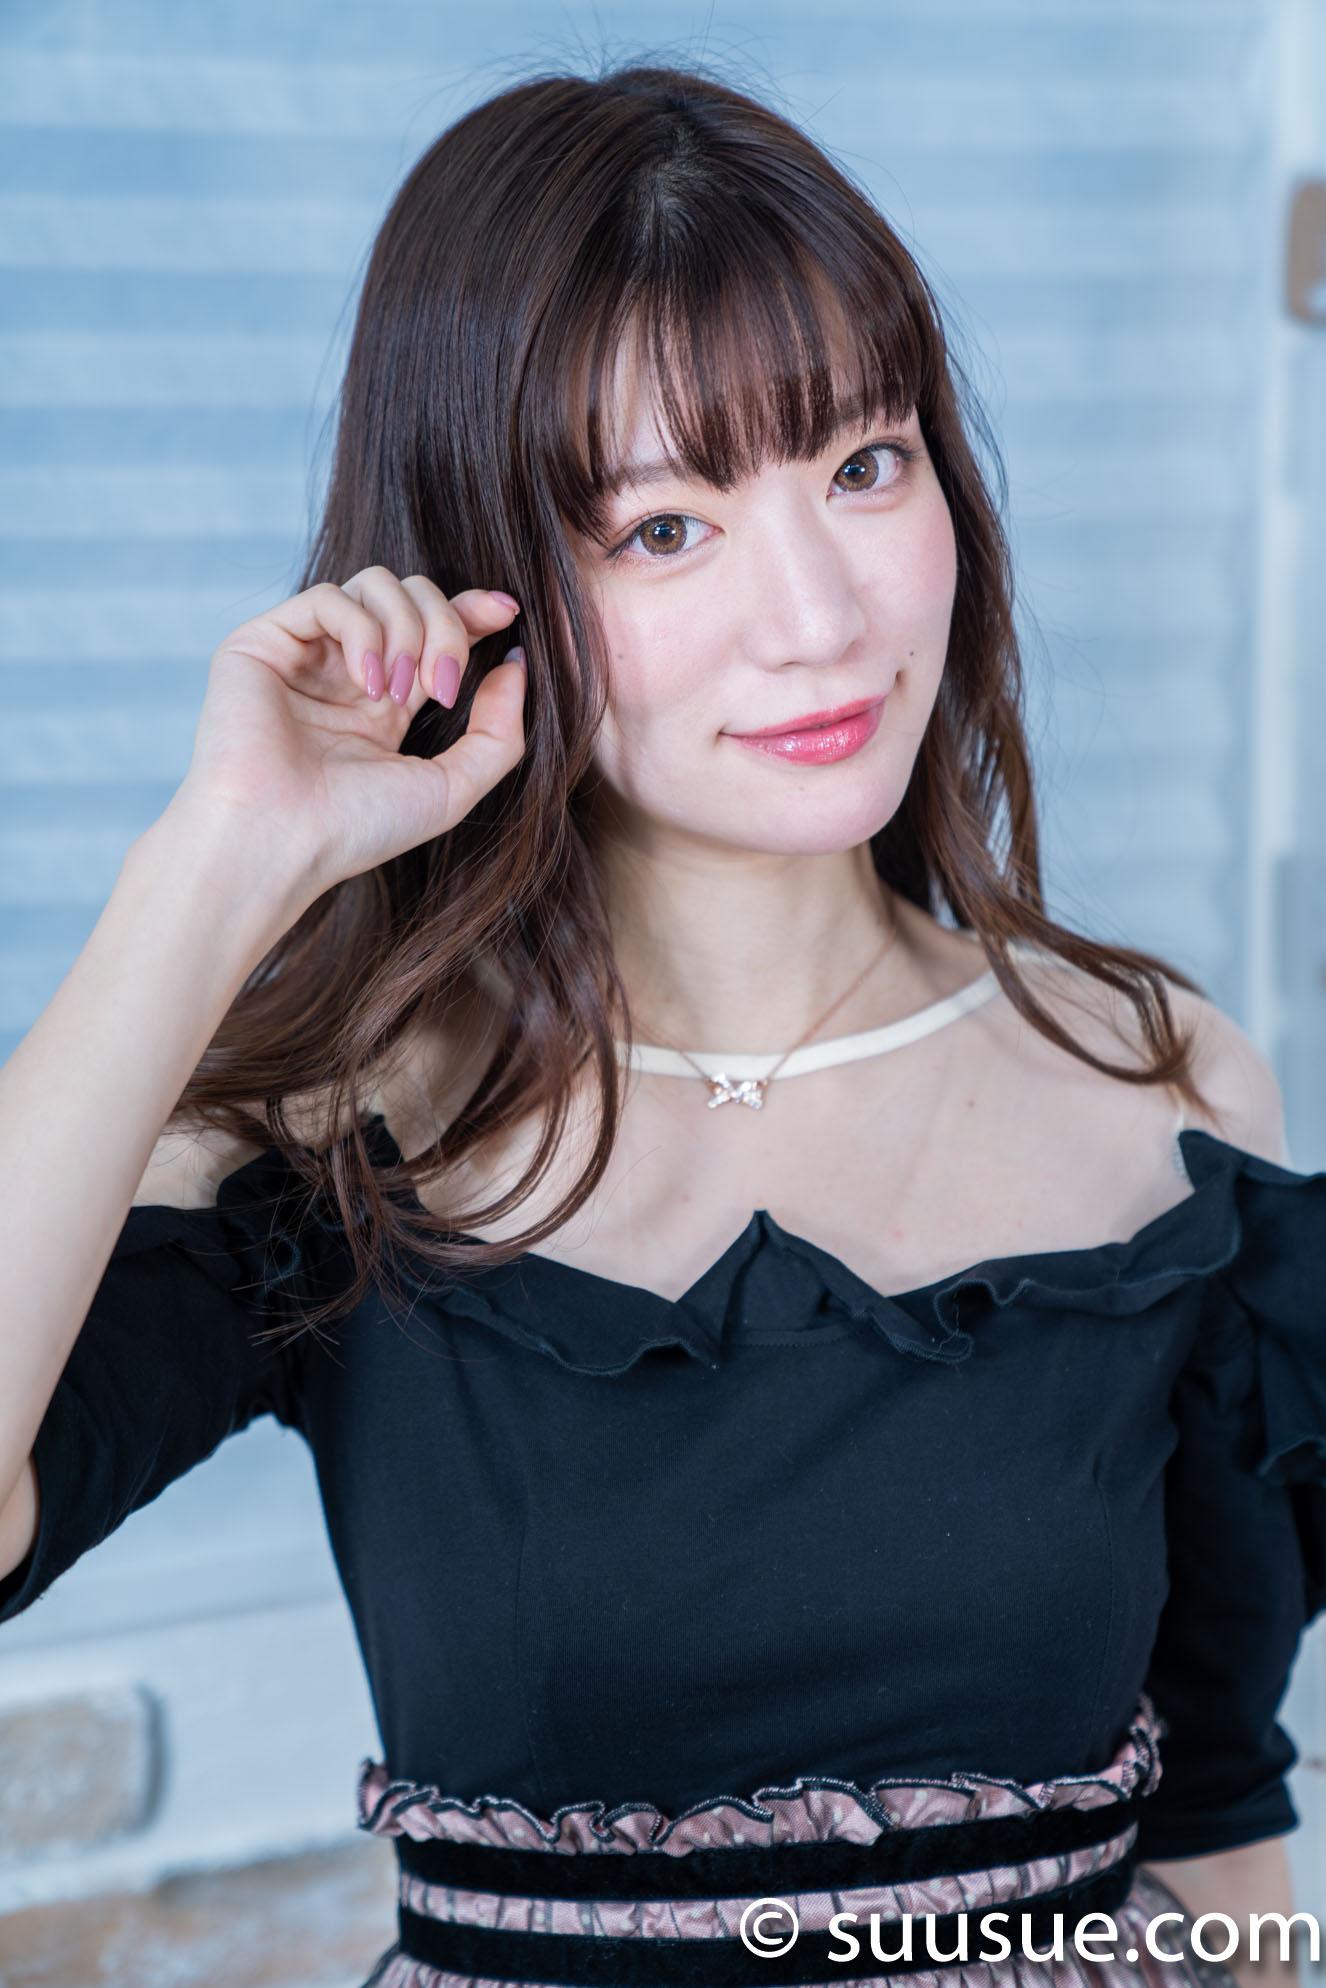 2018/12/01NewType撮影会 小嶋みやび